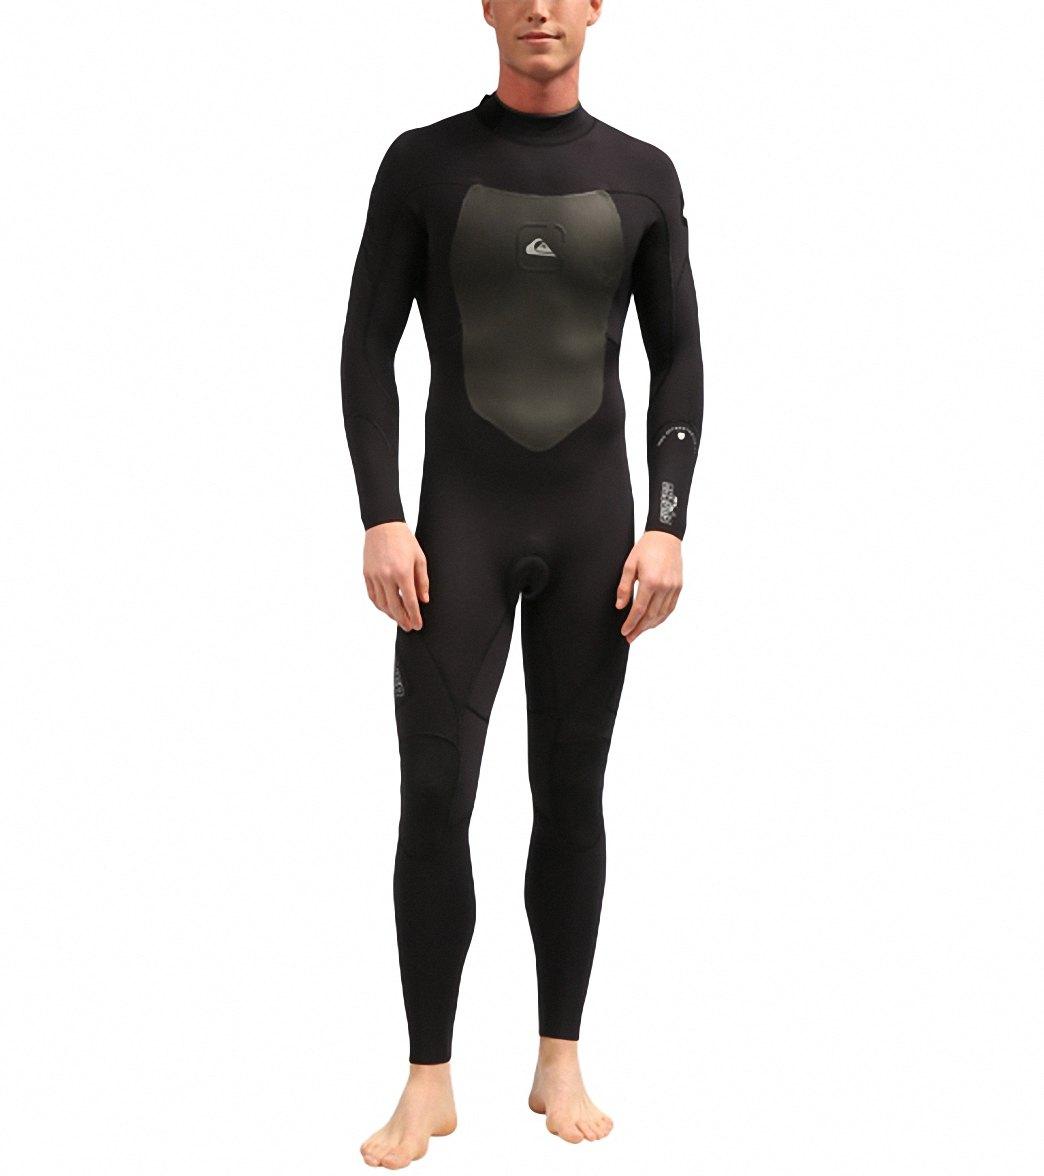 ea003fc943 Quiksilver Men's 3/2MM Syncro Back Zip GBS Fullsuit Wetsuit at ...